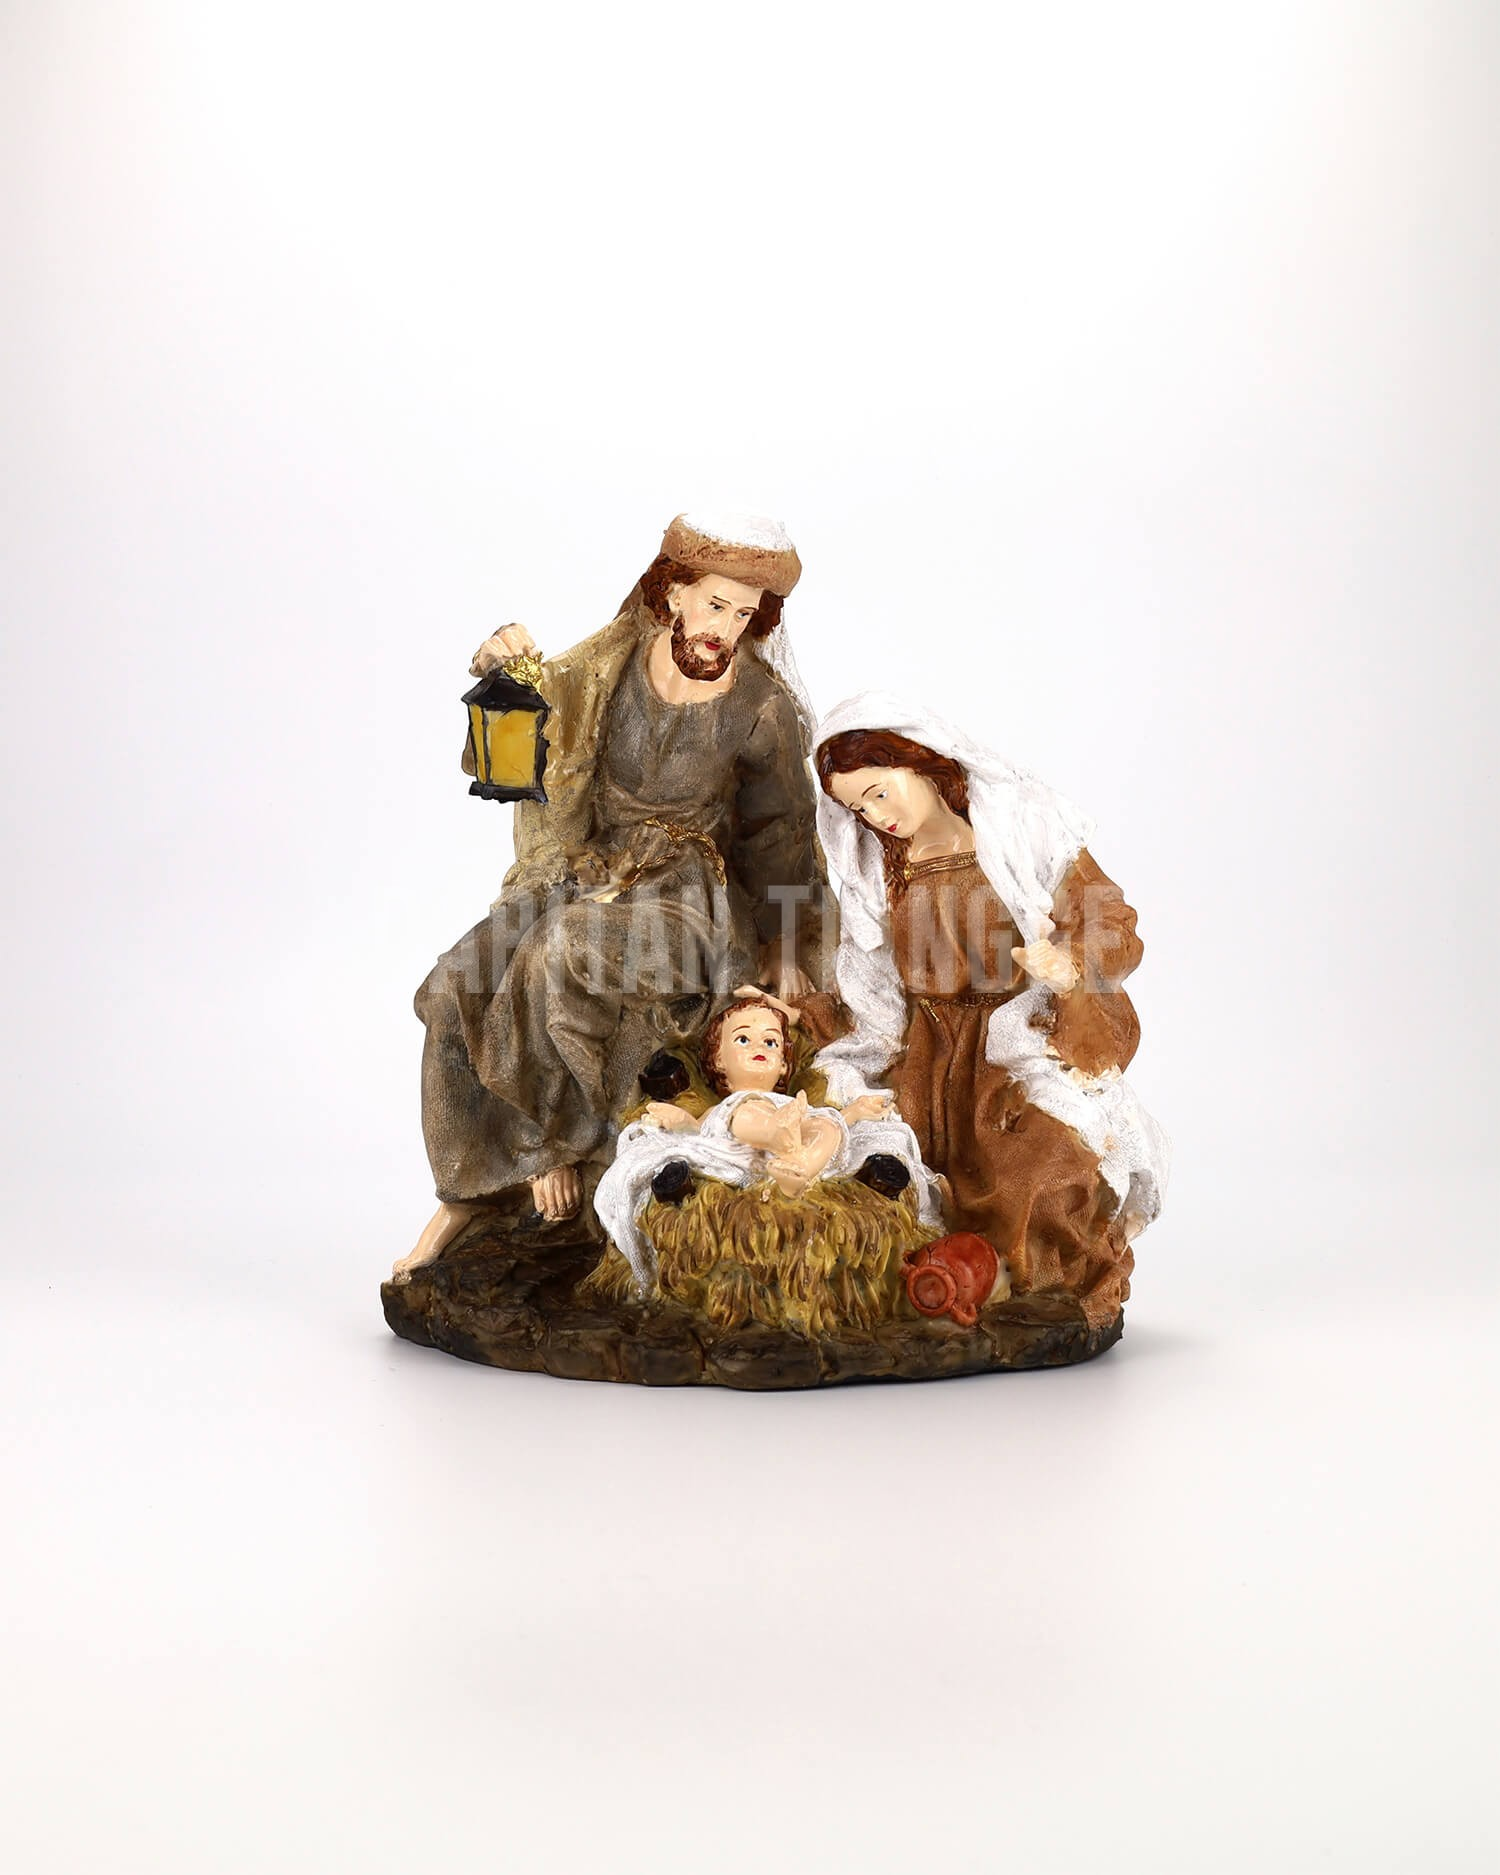 Dapitan Tiangge Rustic Vintage Like Holy Family Nativity Set